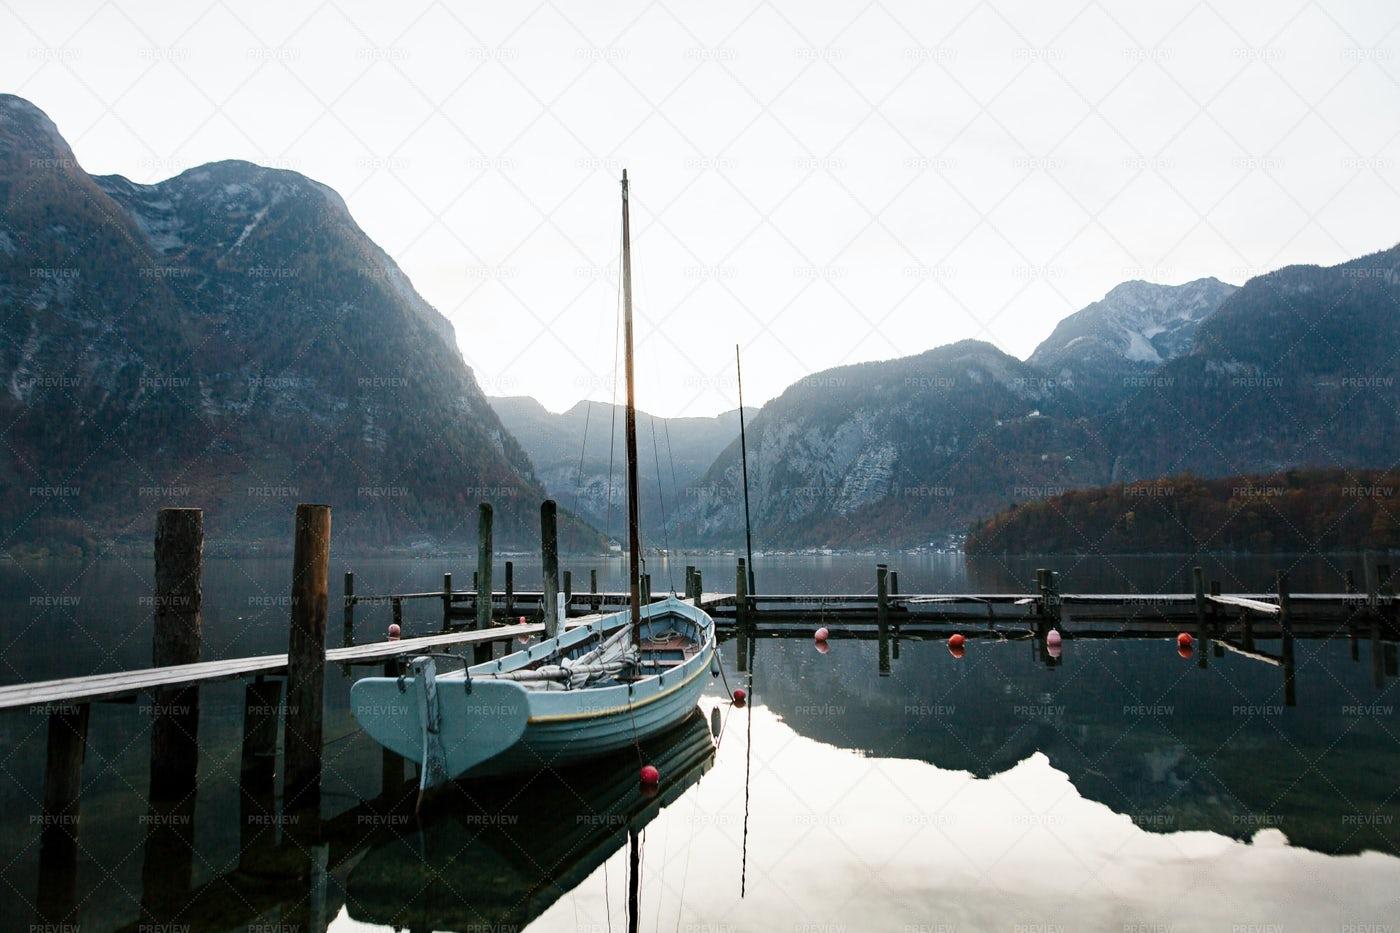 Sailboat On A Lake In Hallstatt: Stock Photos